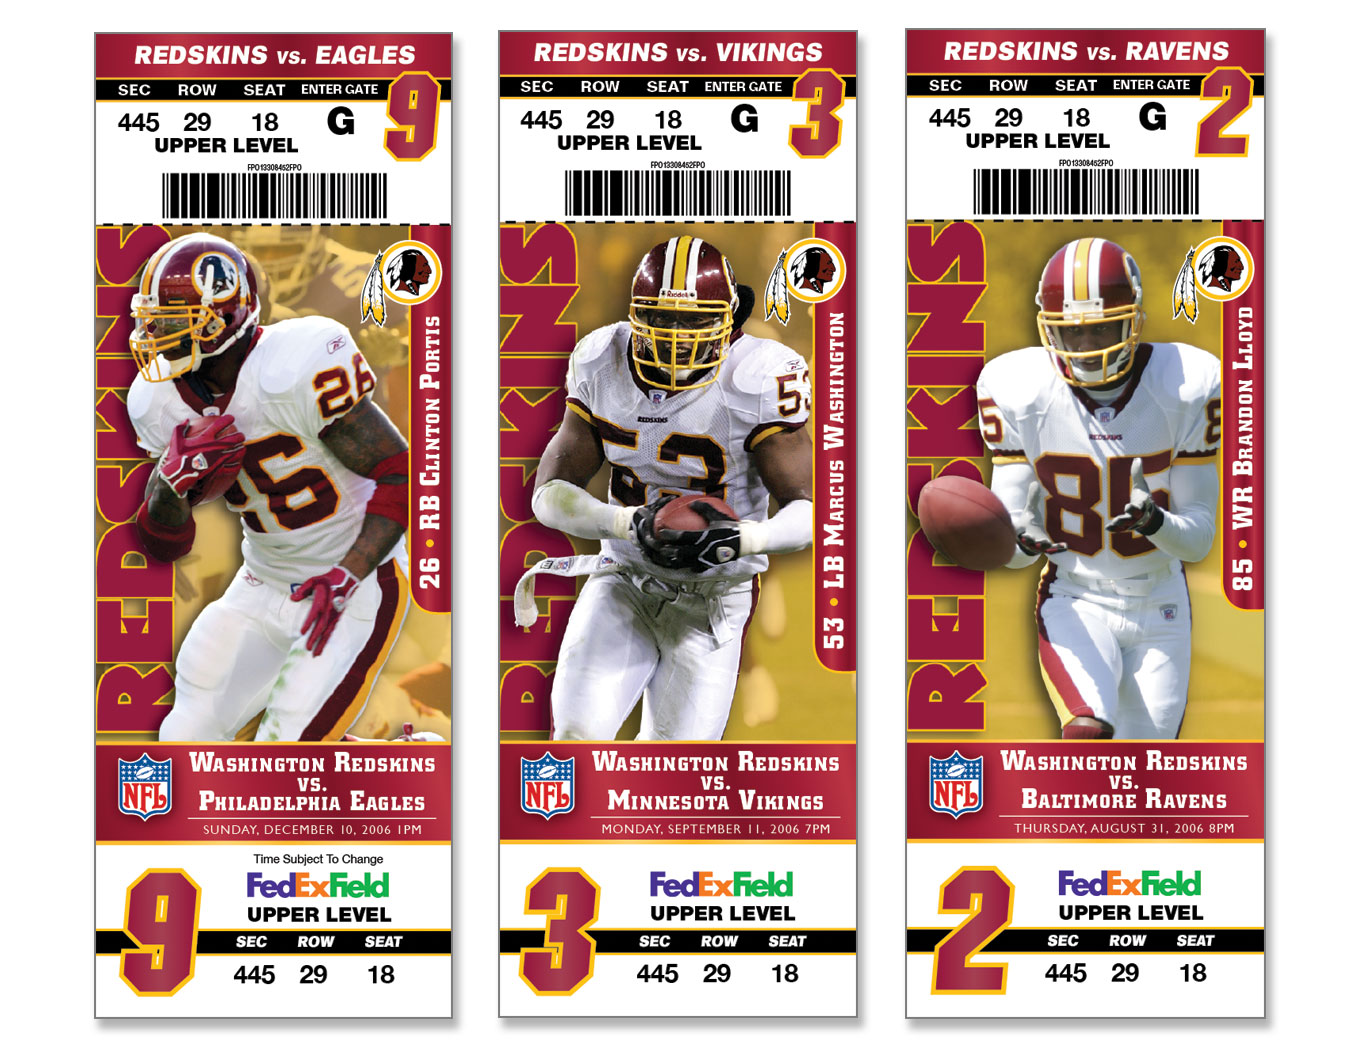 Washington Redskins Stadium Season Tickets